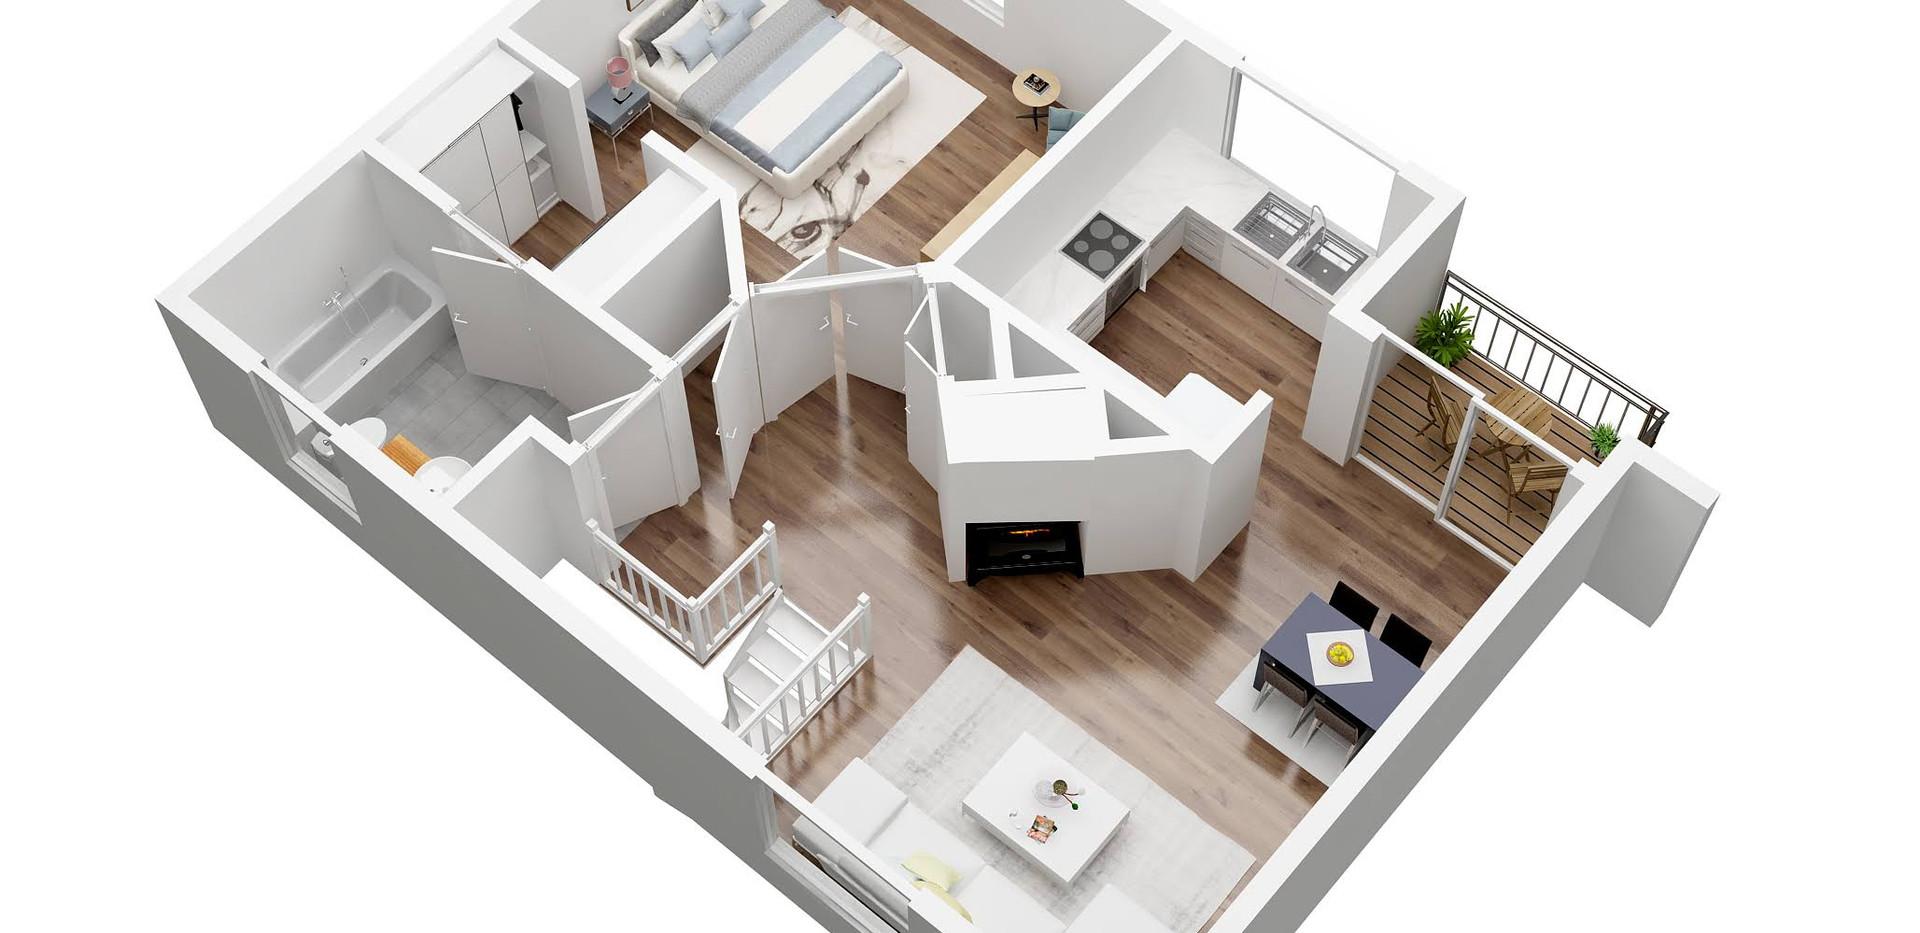 juuleas_2_3D  floor plan